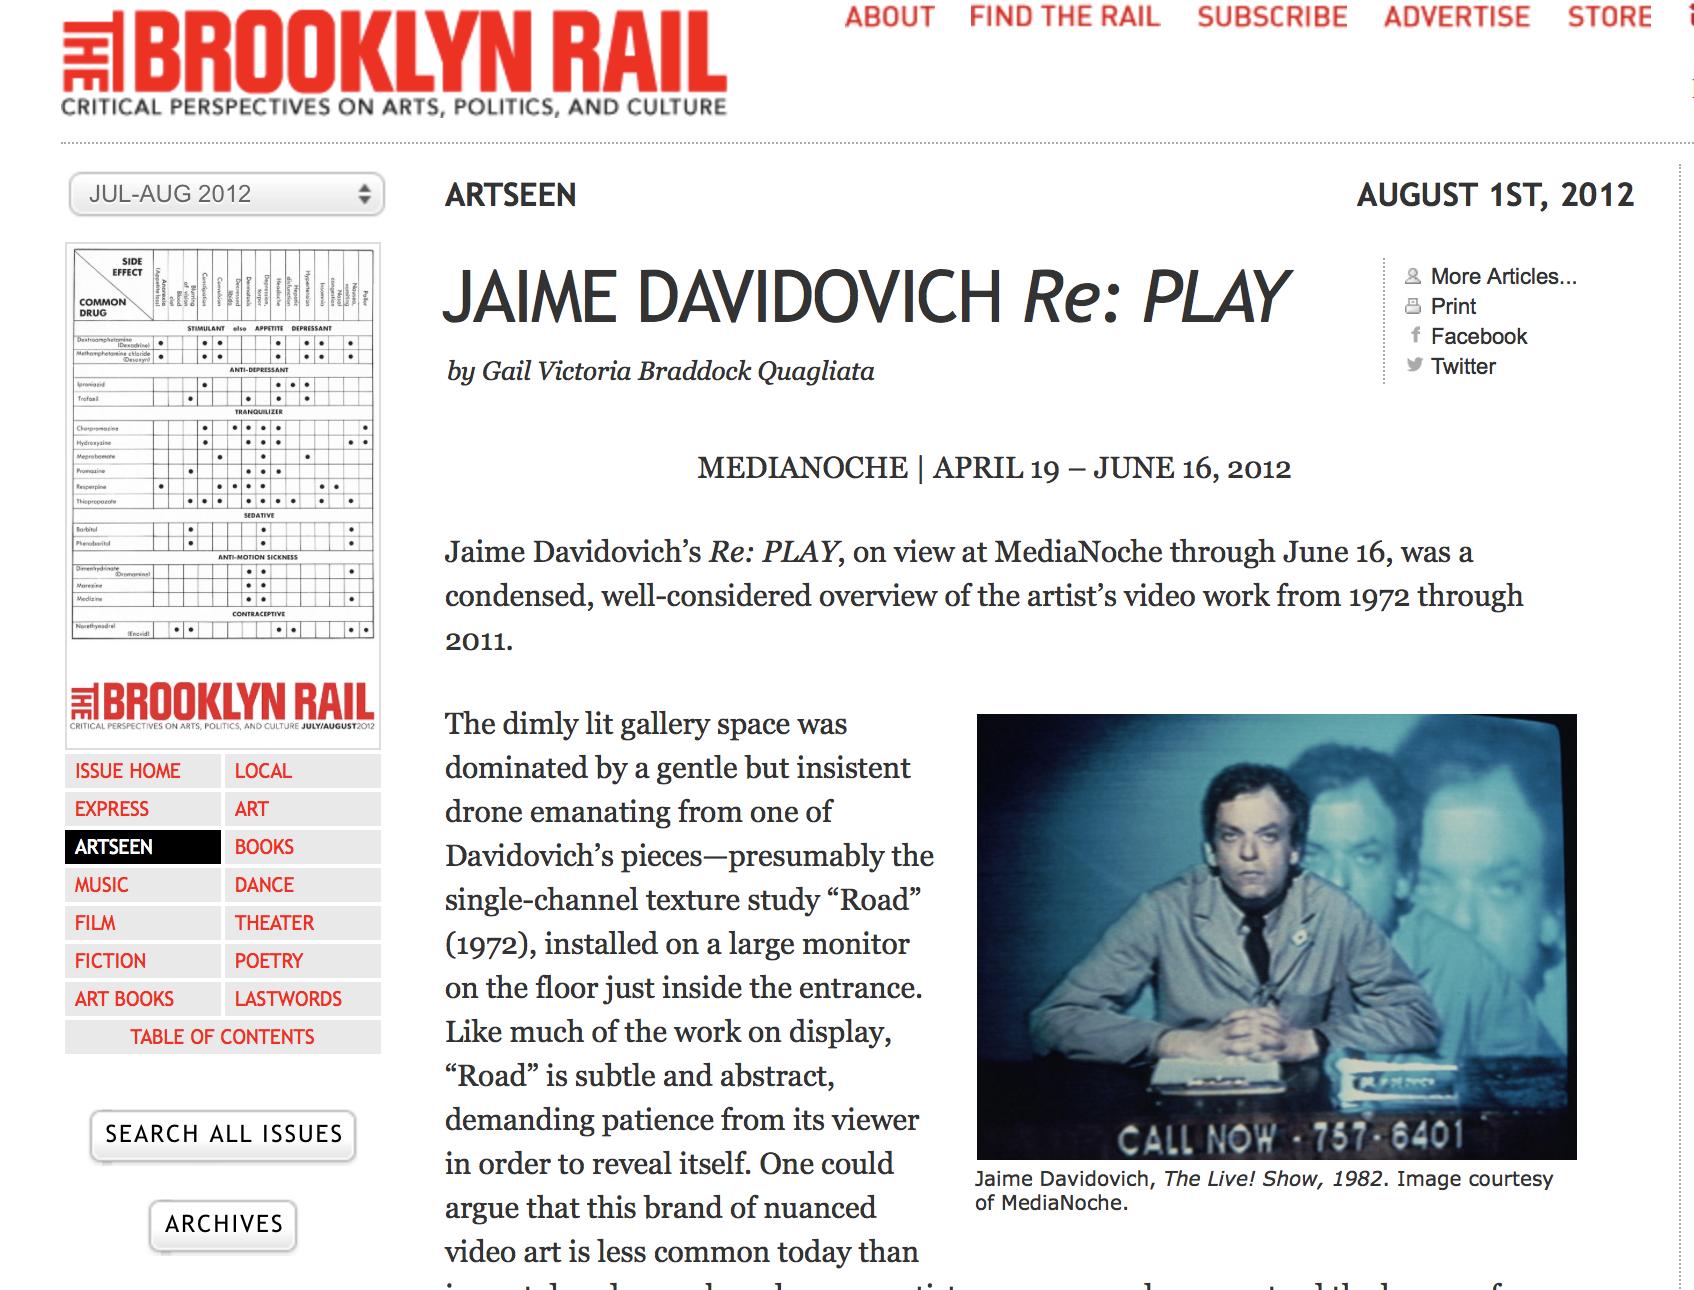 Jaime davidovich Re: Play - The Brooklyn Rail - August 1st, 2012